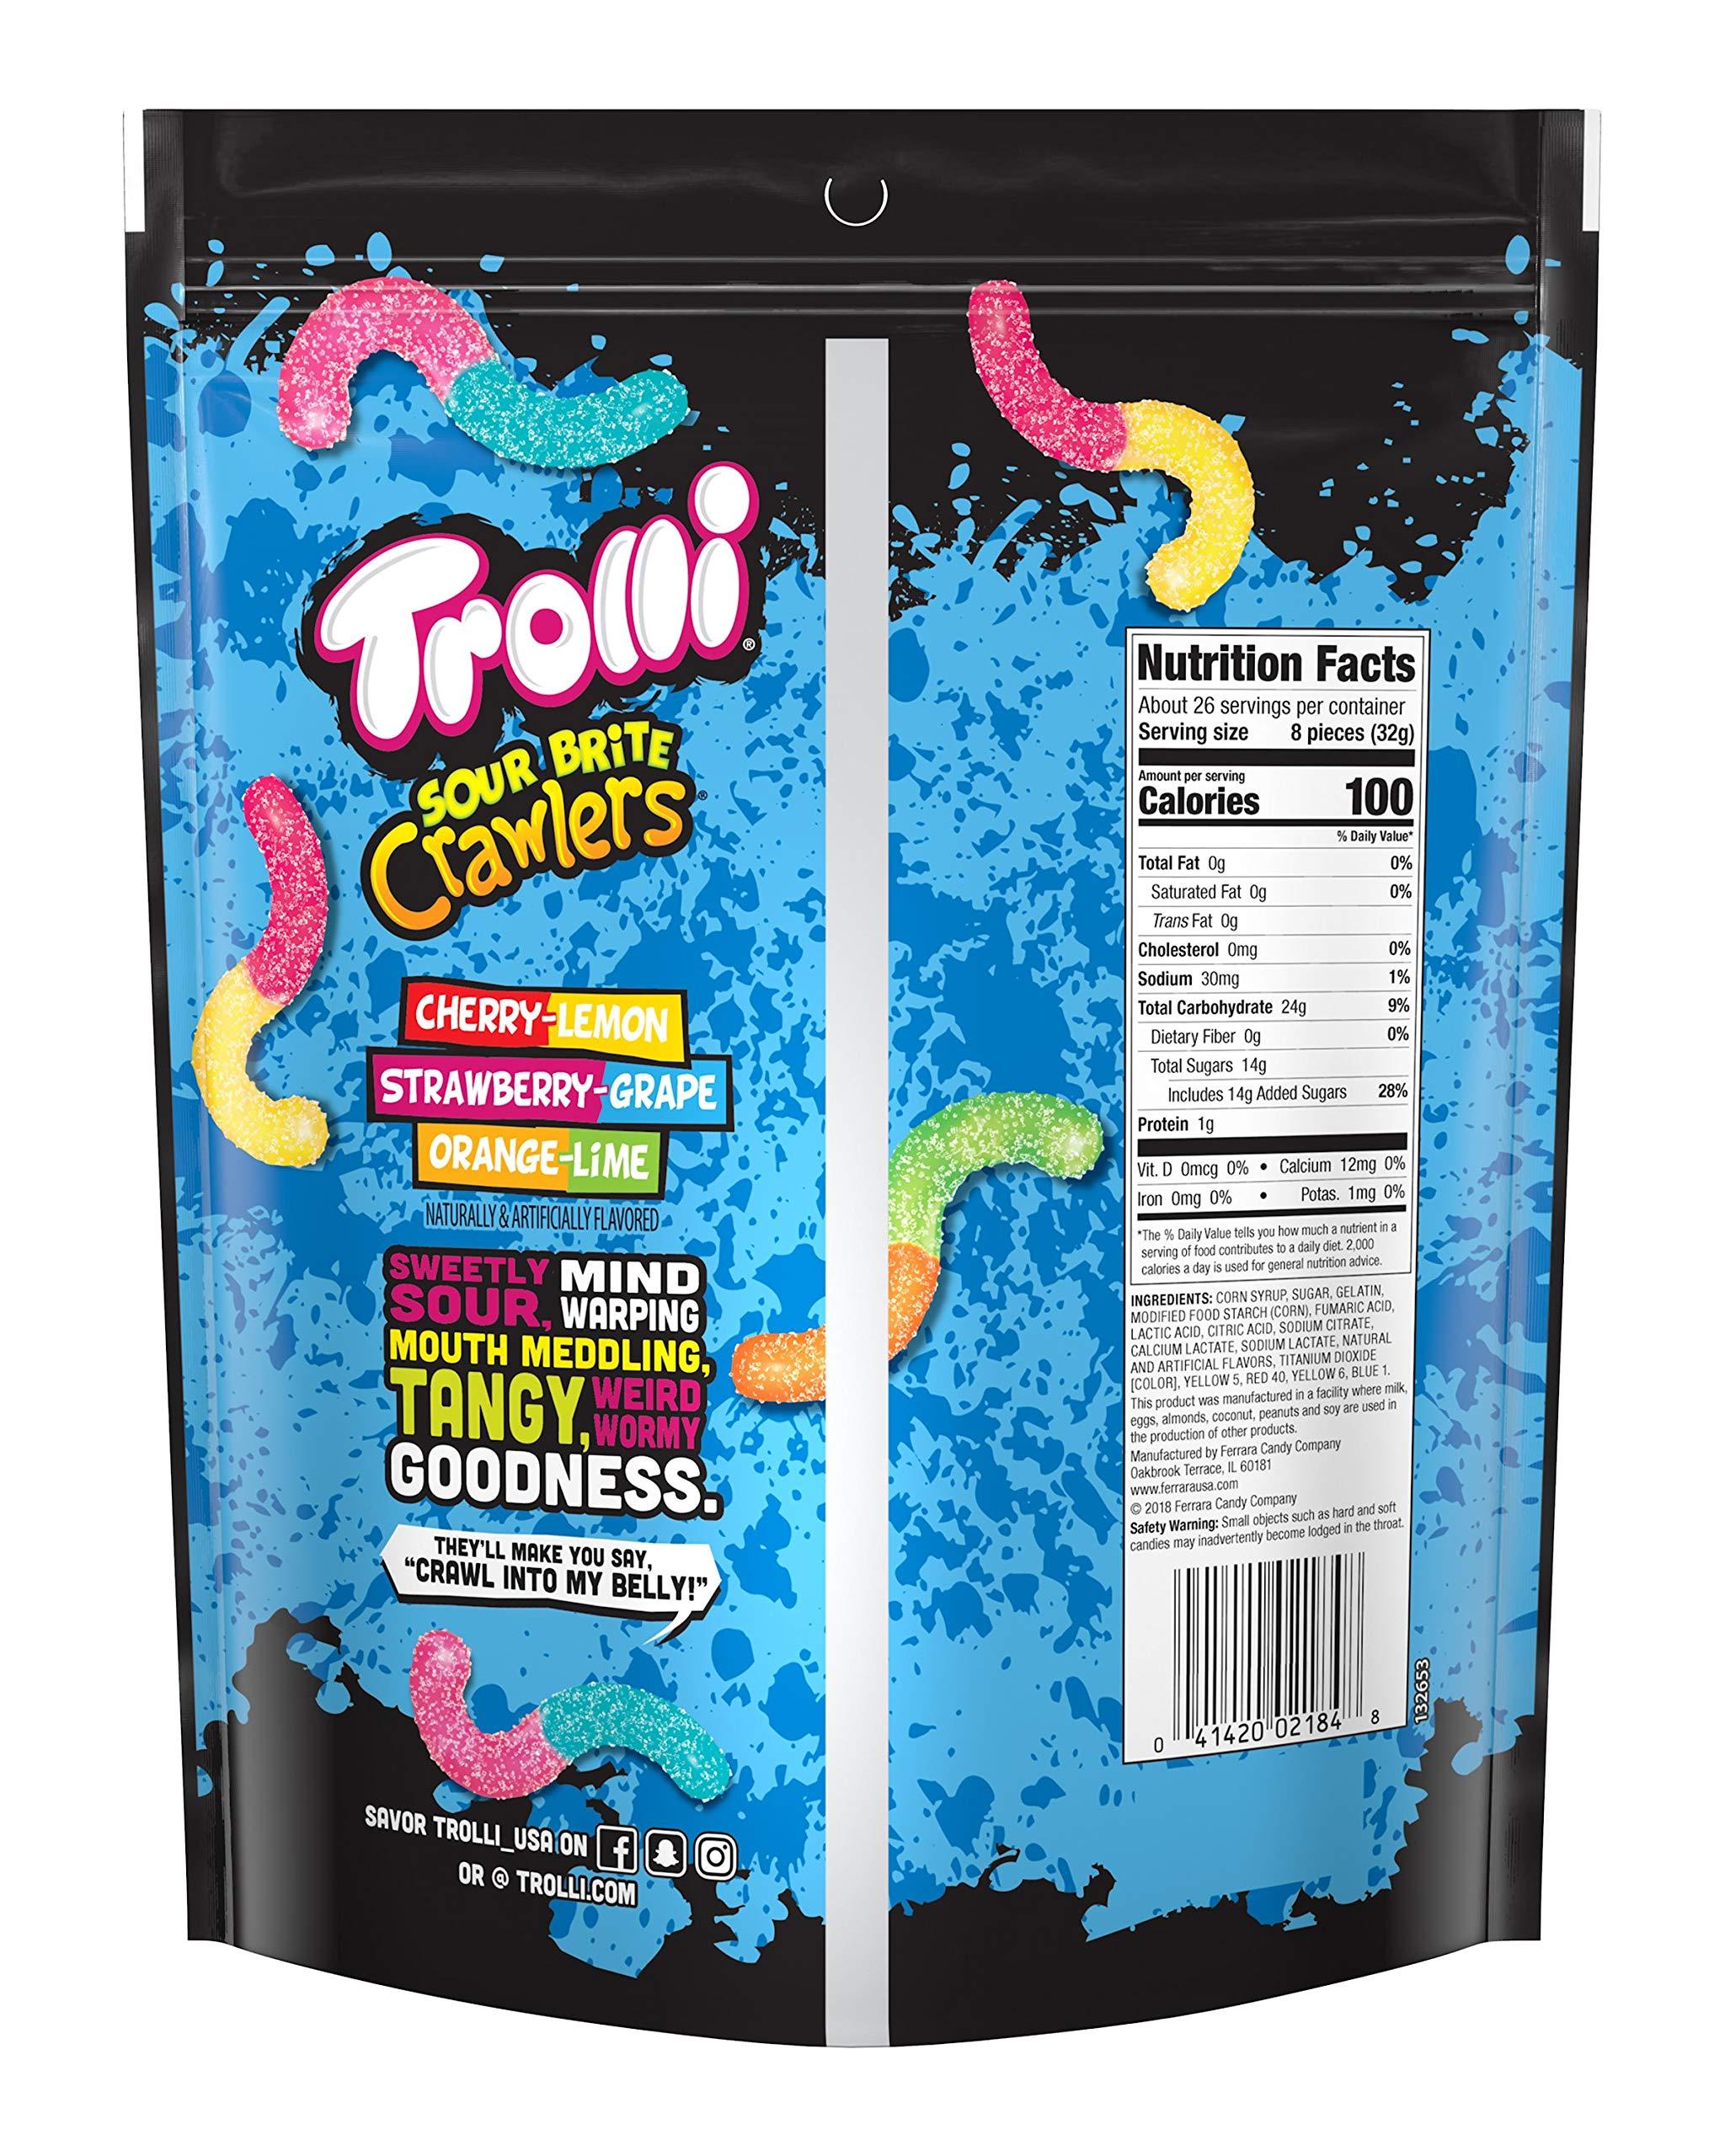 Trolli Sour Brite Crawlers Gummy Worms, 28 Ounce Bag Sour Gummy Worms by Trolli (Image #2)